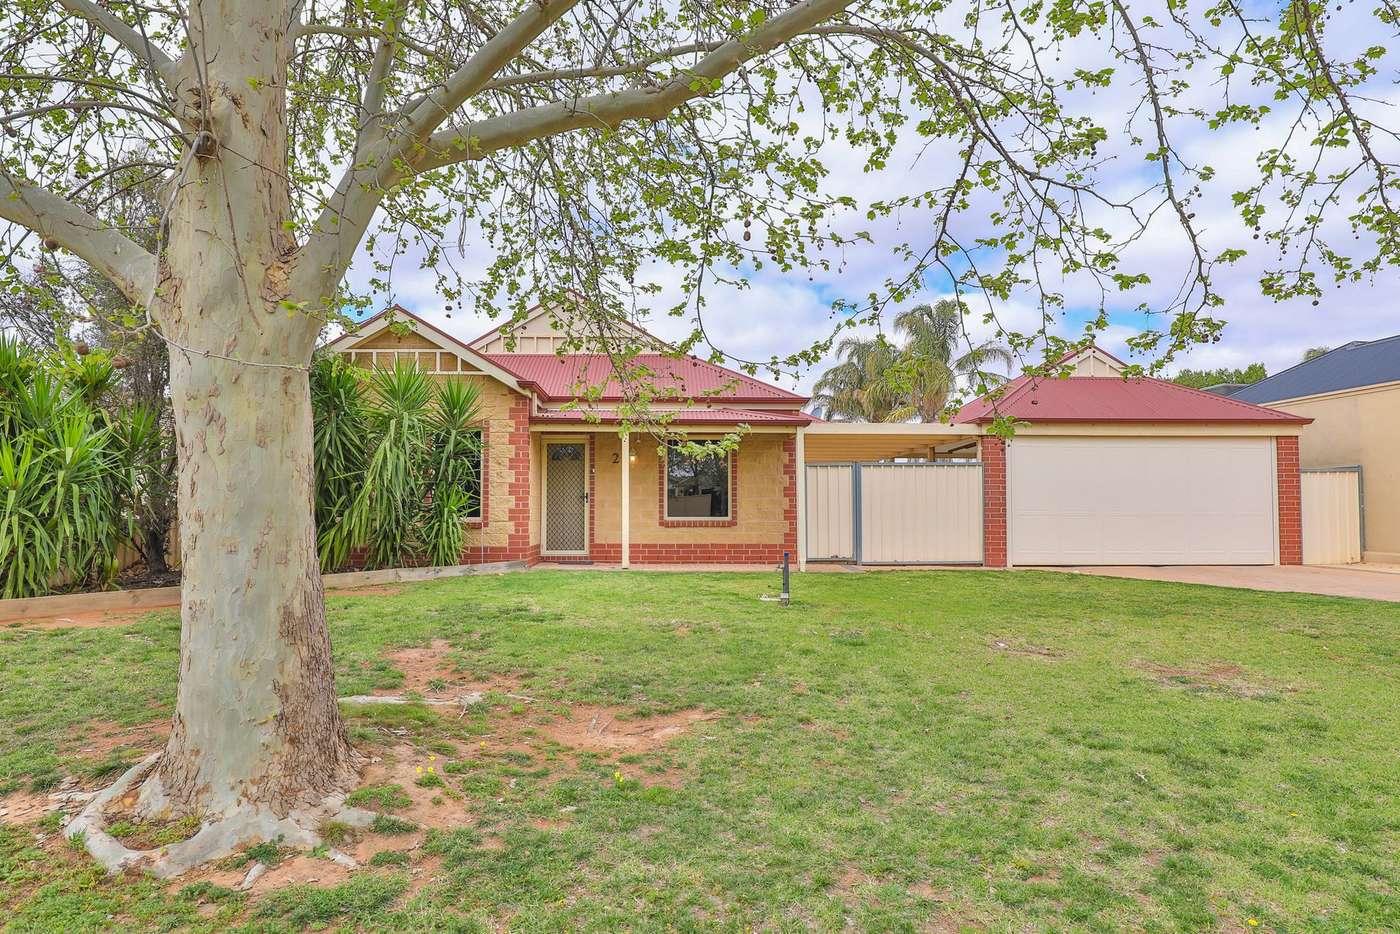 Main view of Homely house listing, 2 Plane Tree Drive, Mildura VIC 3500